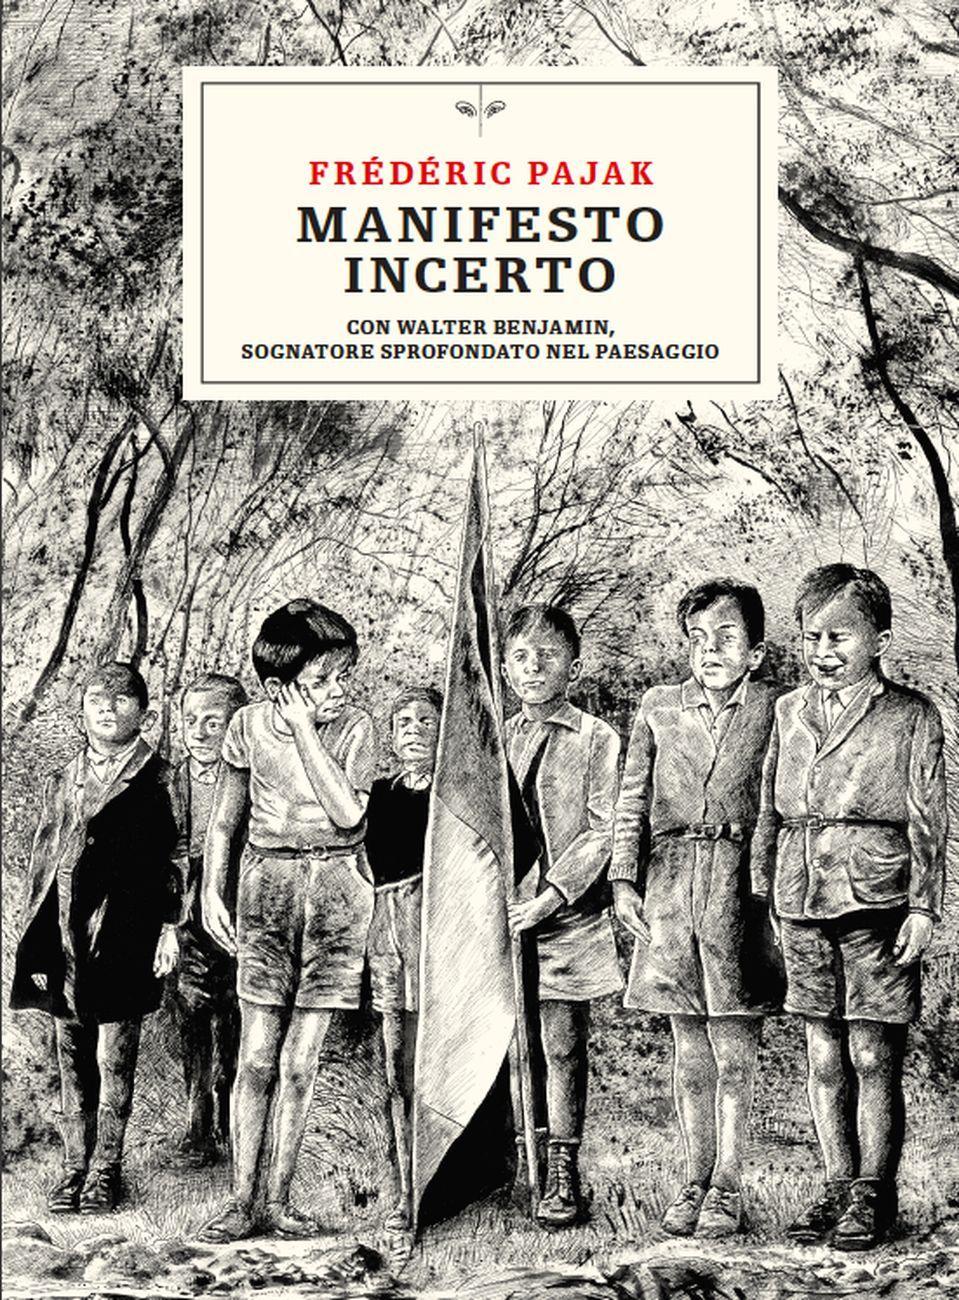 Frédéric Pajak - Manifesto incerto, I (L'orma, Roma 2020)